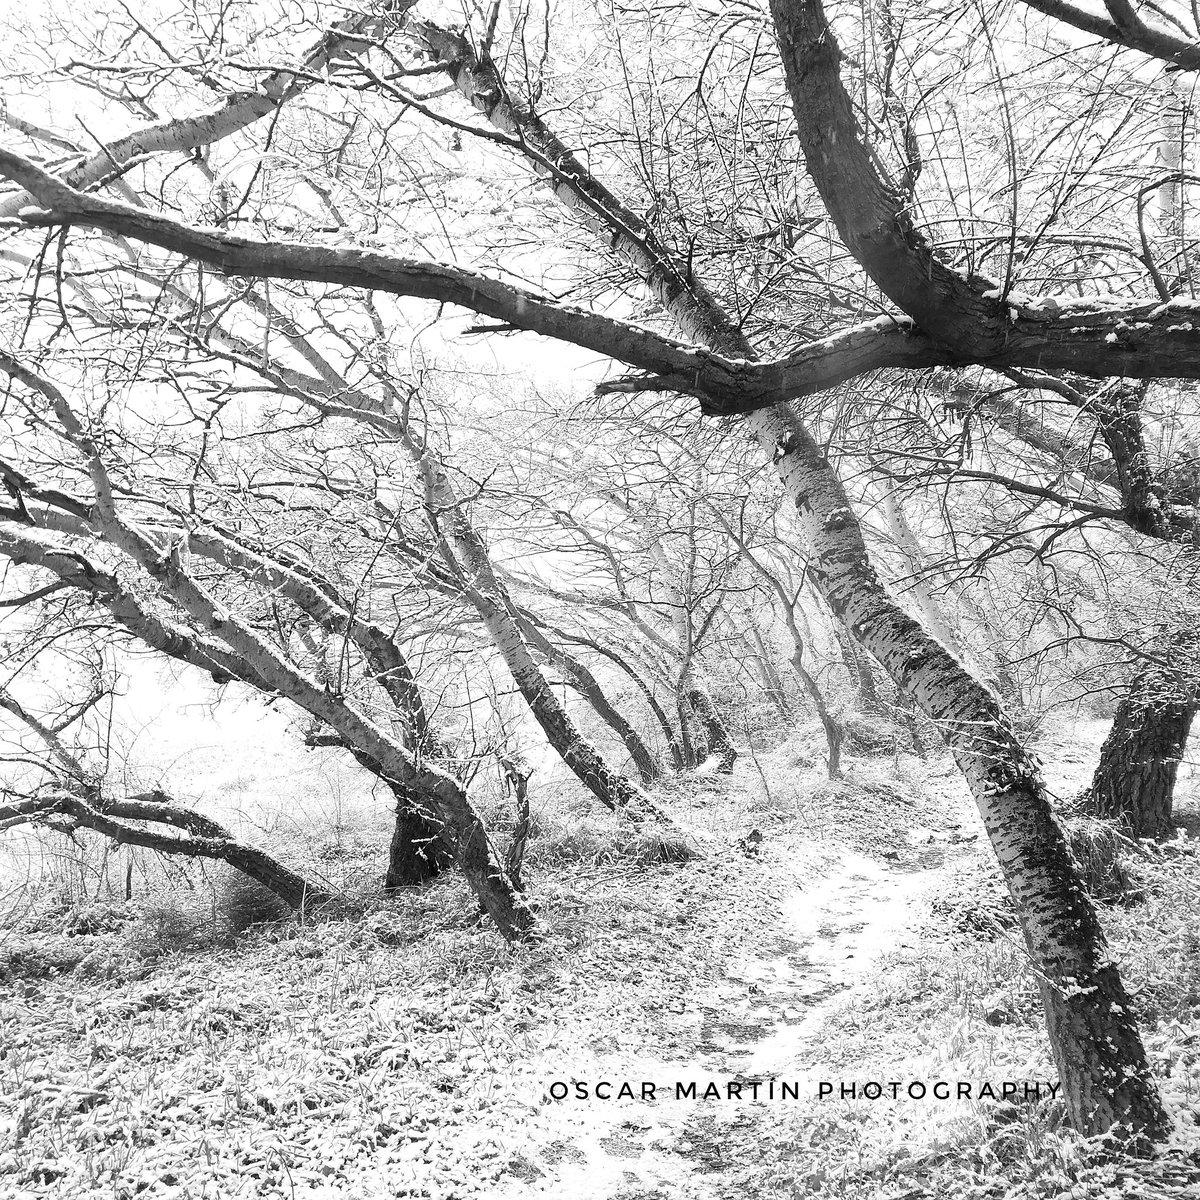 White Nature. Serie V   #NievaEnMadrid  #nievemadrid #Fotografía #Photography #blancoynegro #blackandwhite #bnw #bw #monochrome #HuaweiP20Lite #HuaweiP20 #BorrascaFilomena #alcaladehenares